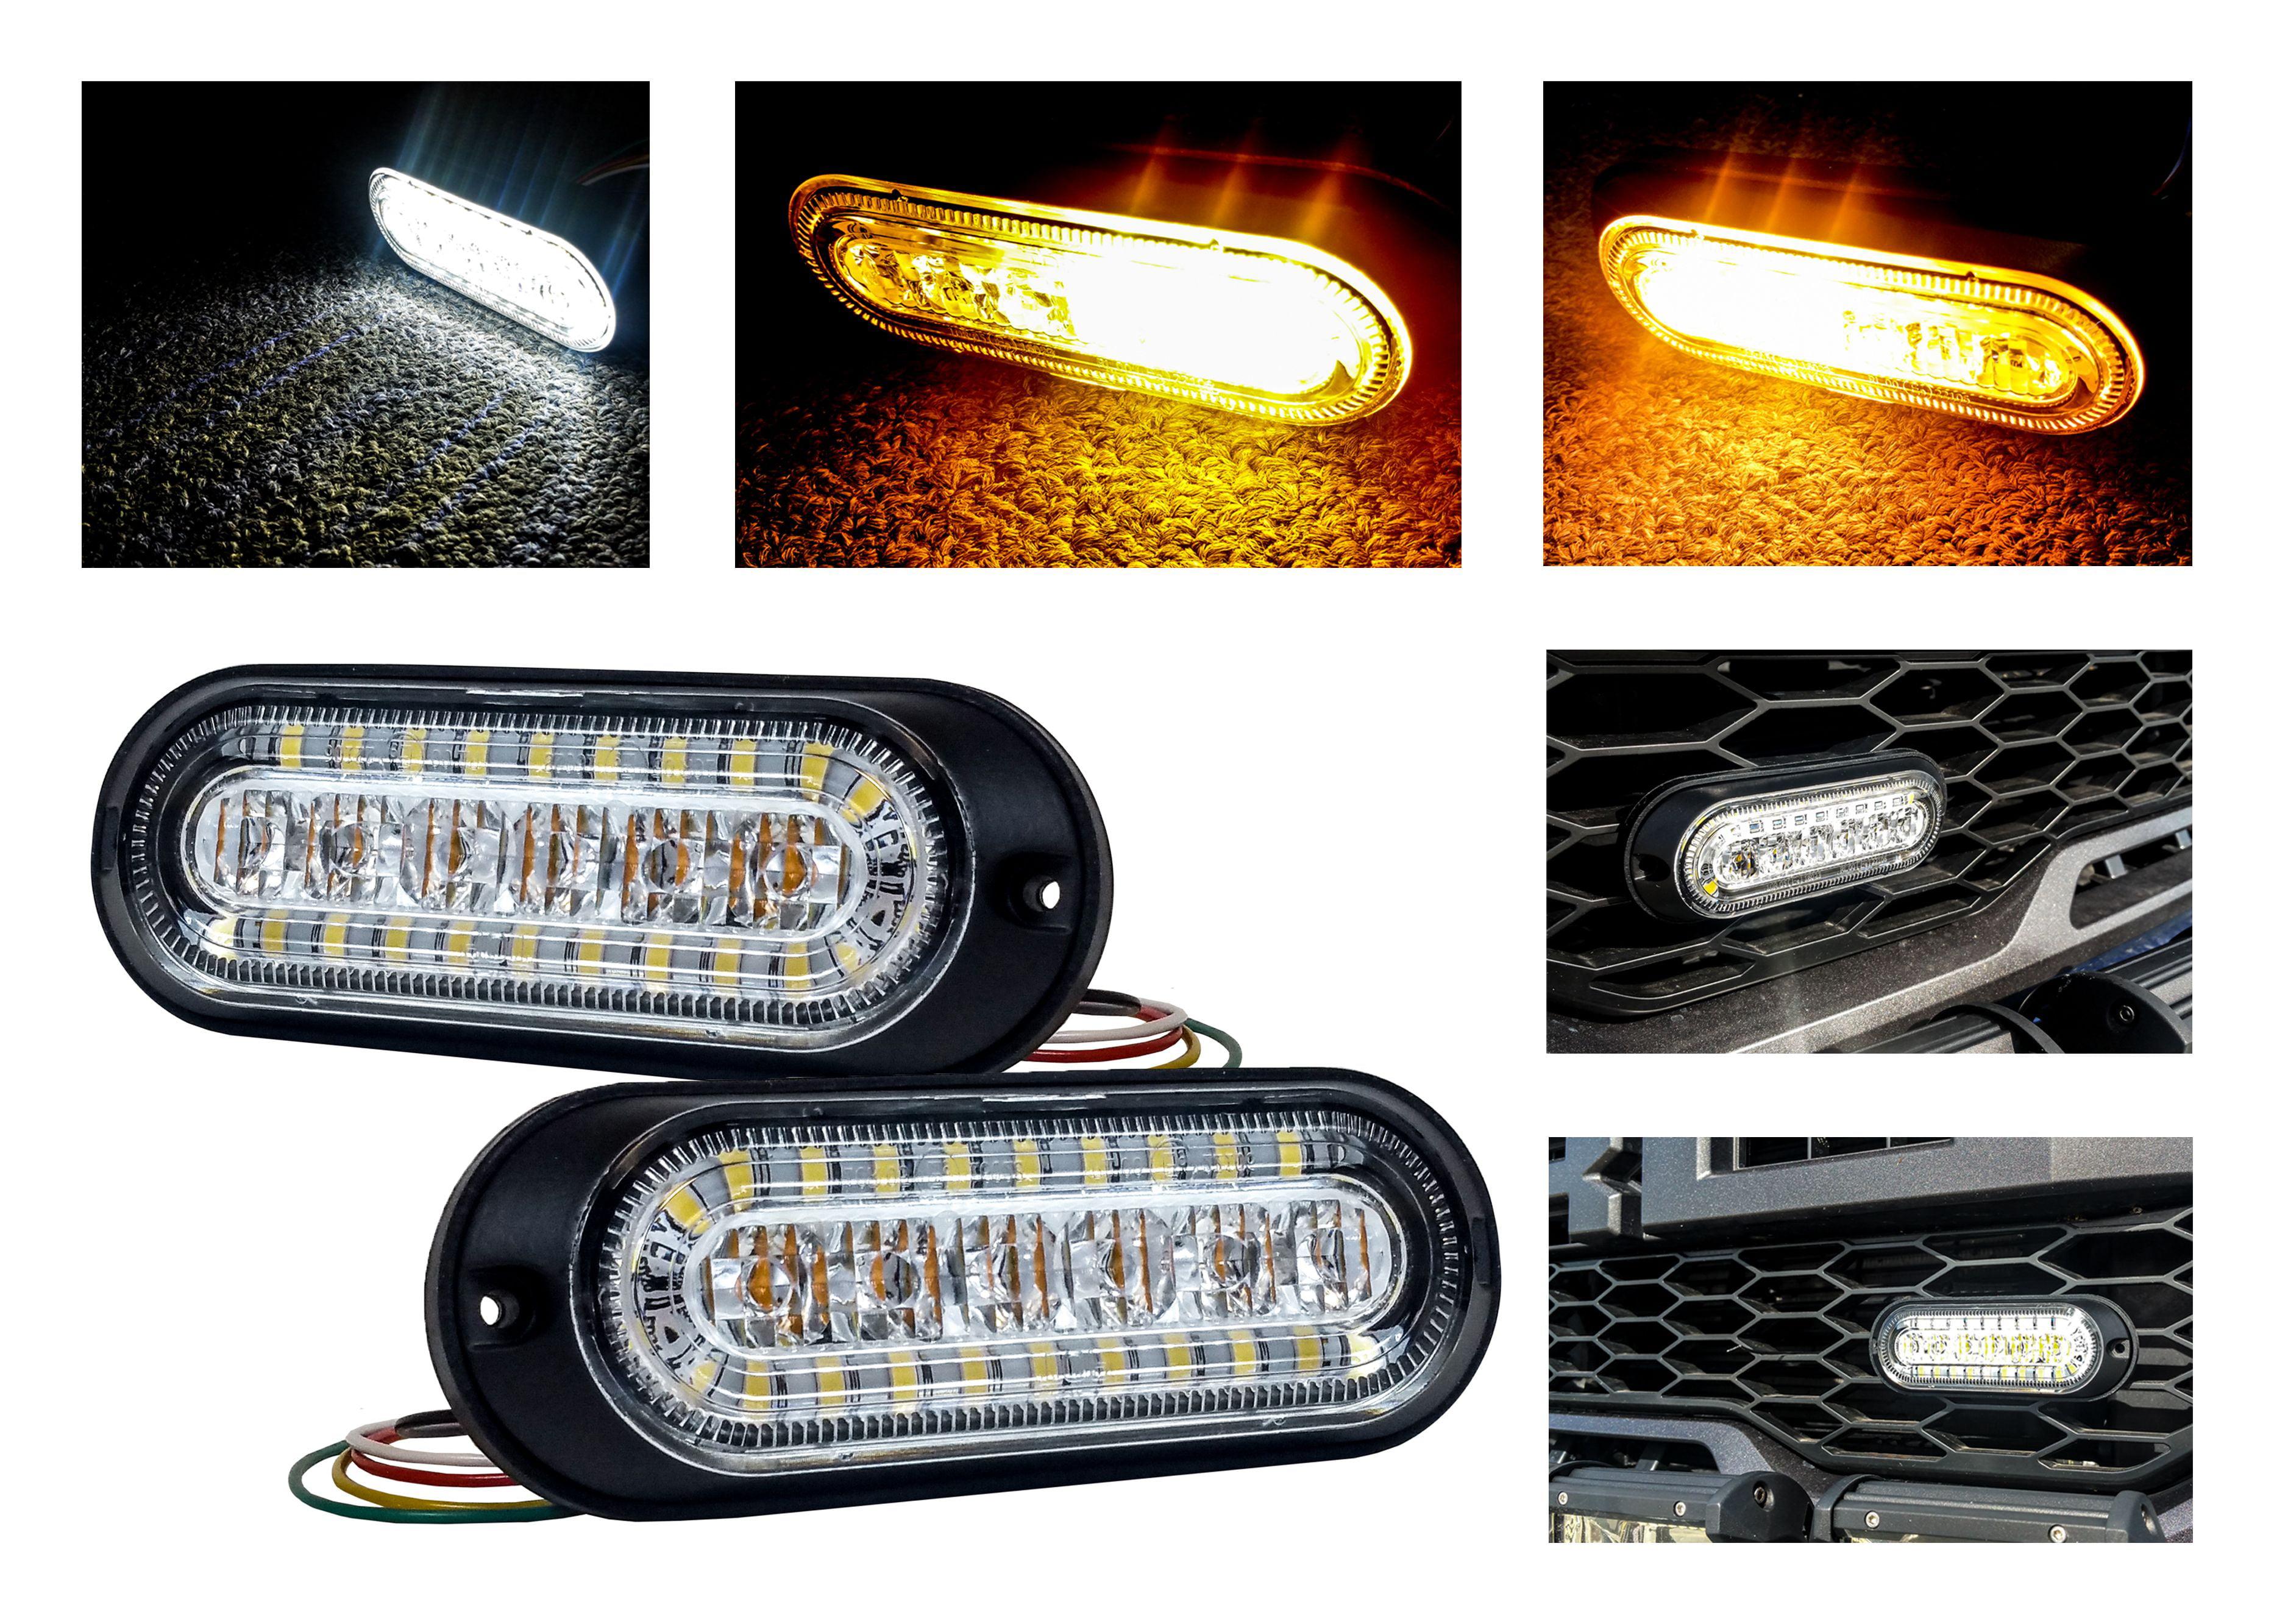 4 LED 12 Watt Amber Emergency Strobe Surface Grill Mount Light Tow Farm Truck